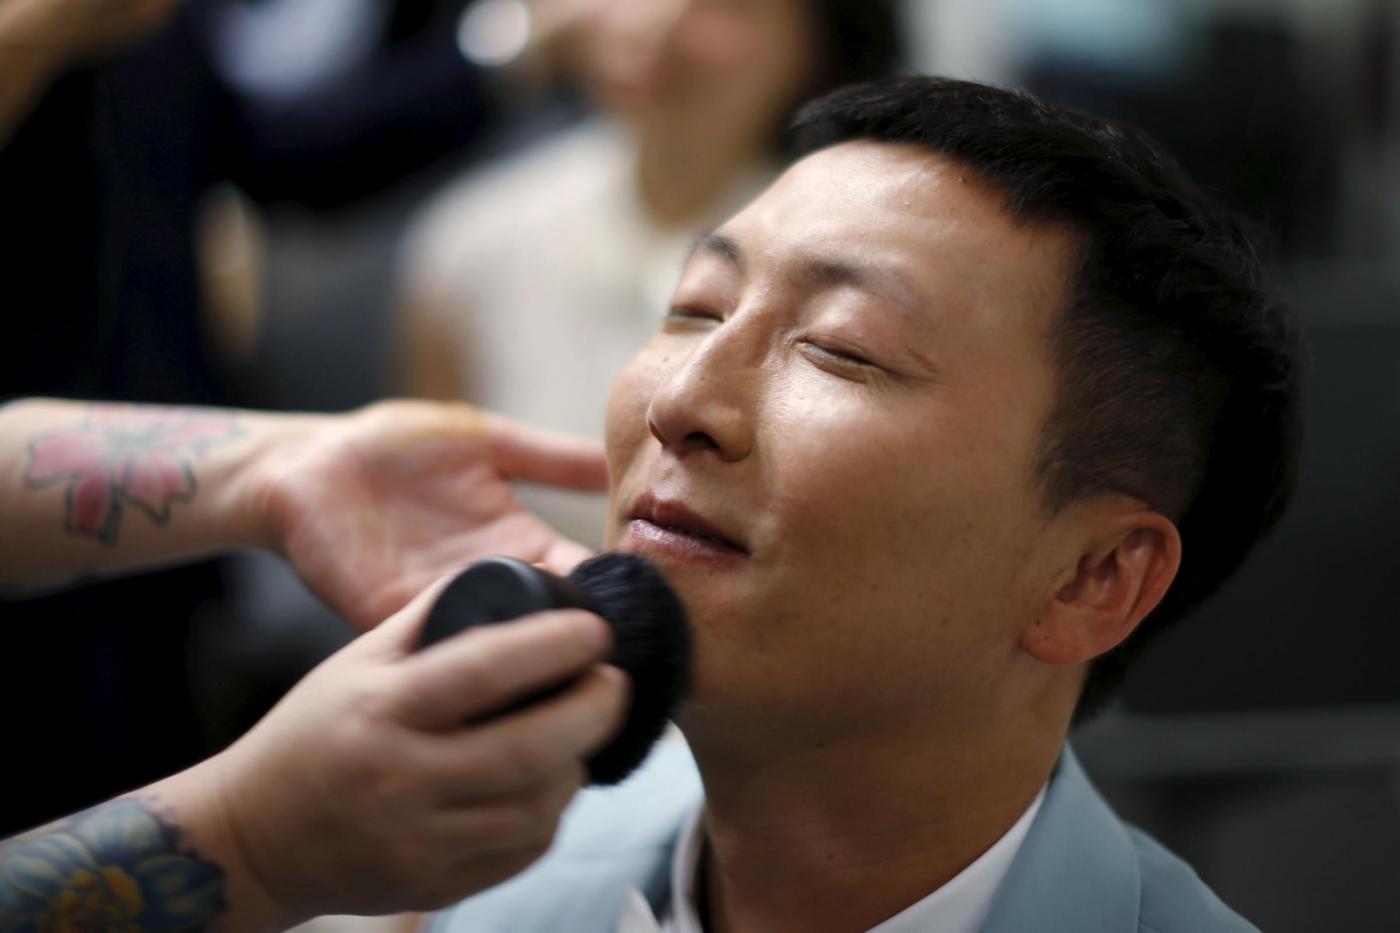 Sette coppie omosessuali cinesi si sposano a Los Angeles04